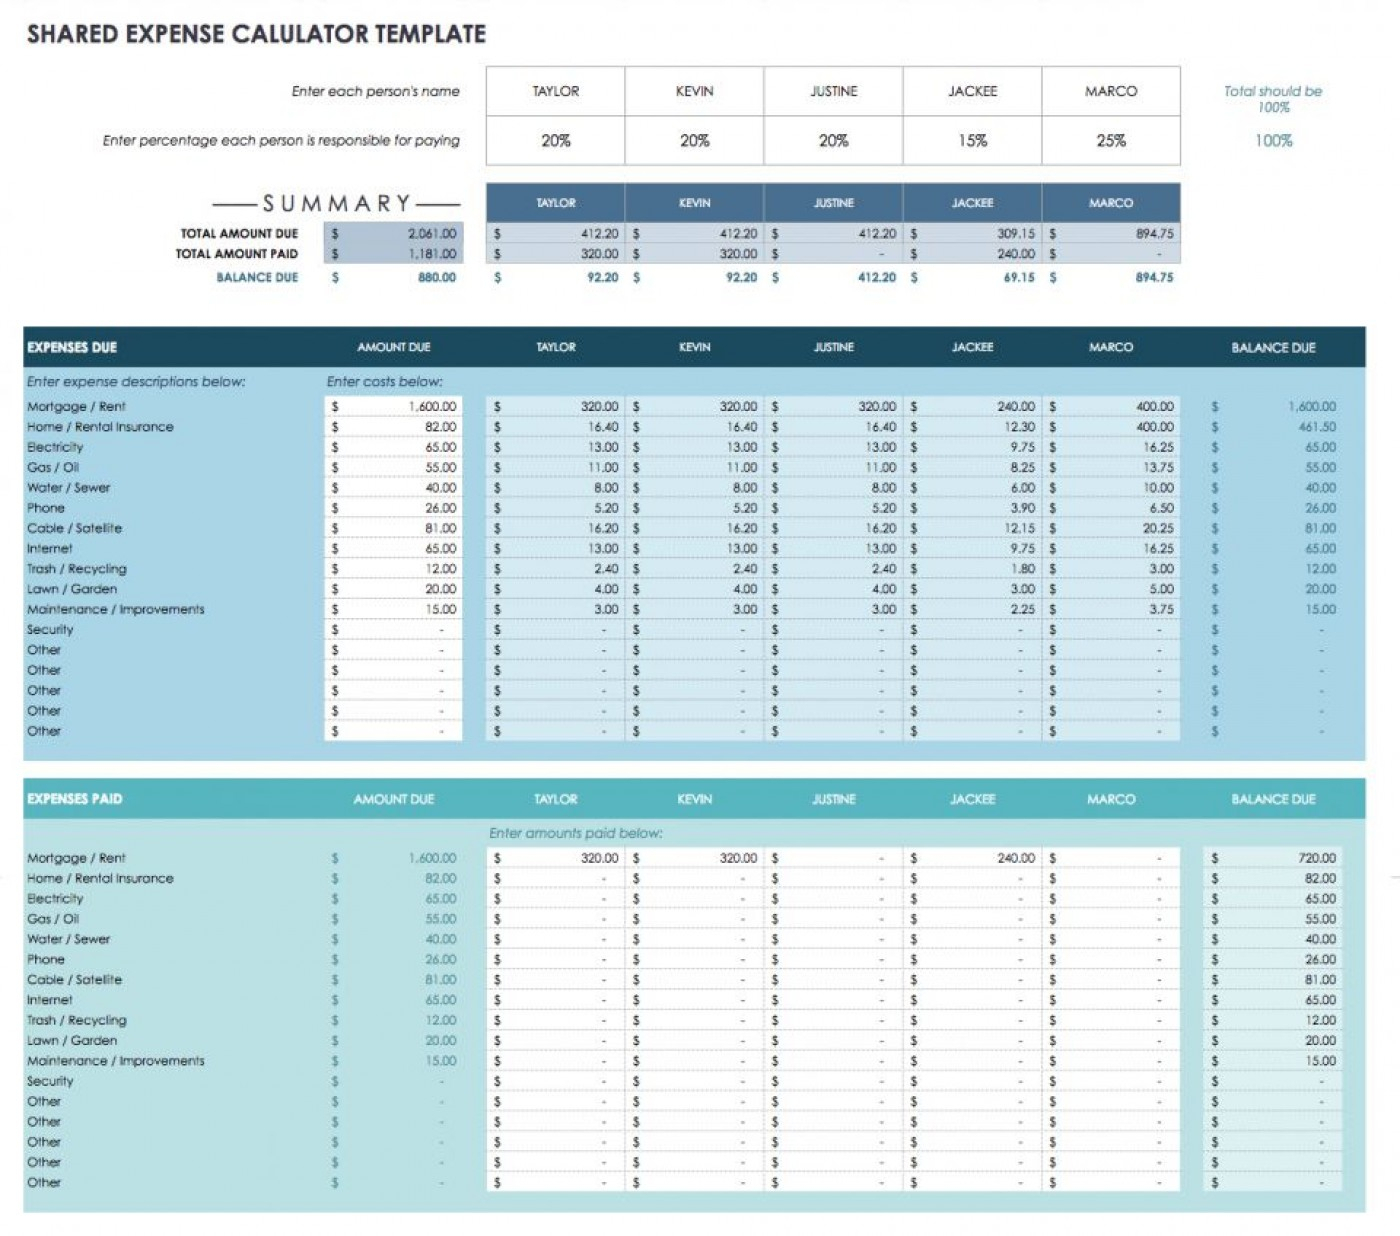 Roommate Expense Spreadsheet Within 006 Ic Google Spreadsheet Shared Expense Calculator